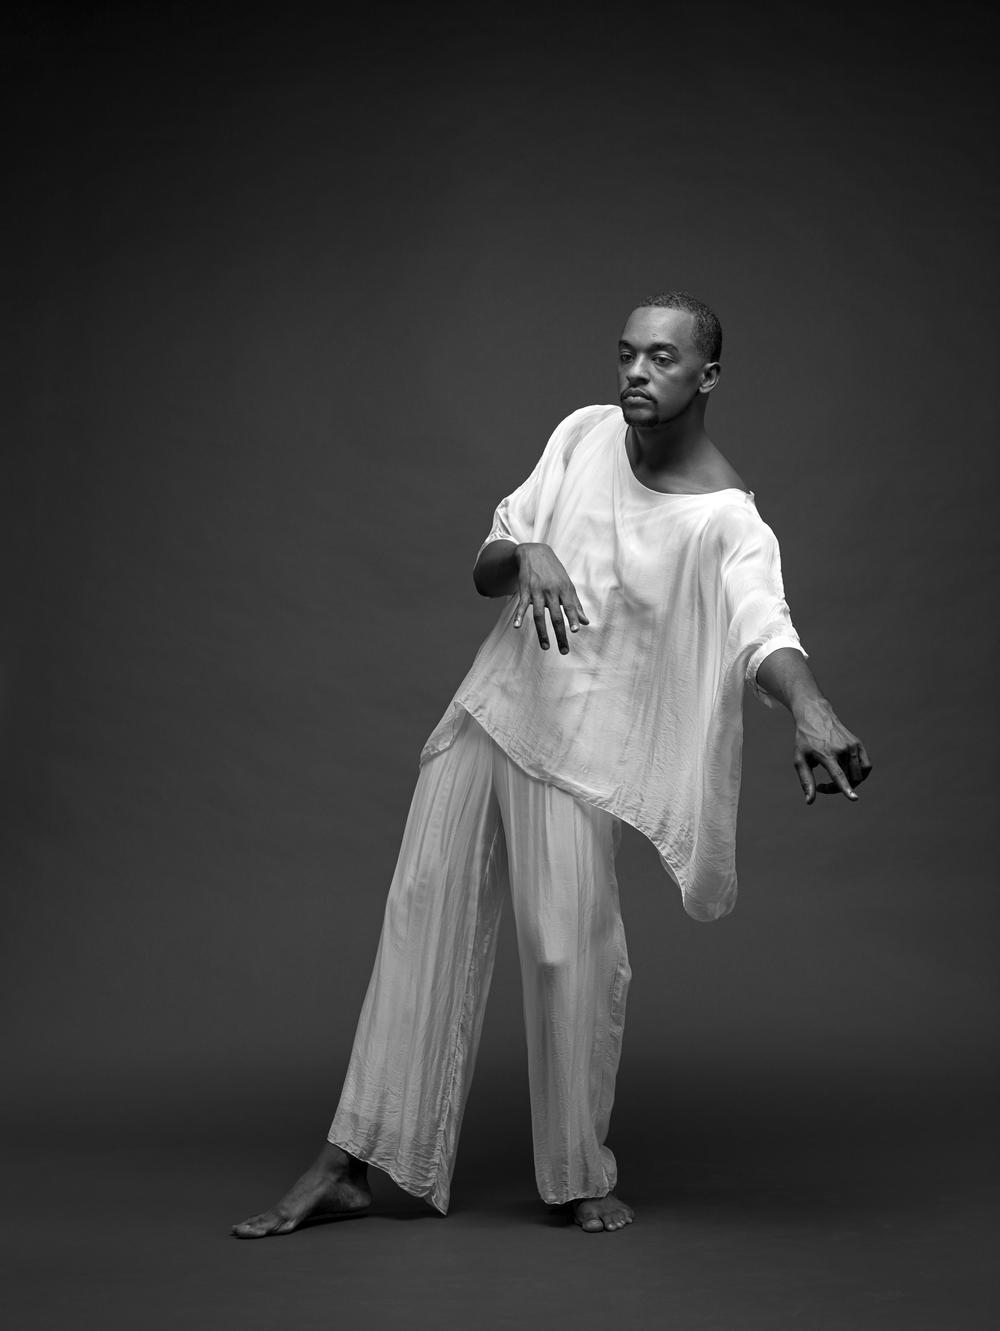 04_Jamal-Dark-Blue-Background-White-Shirt-White-Pants_0277 2.png